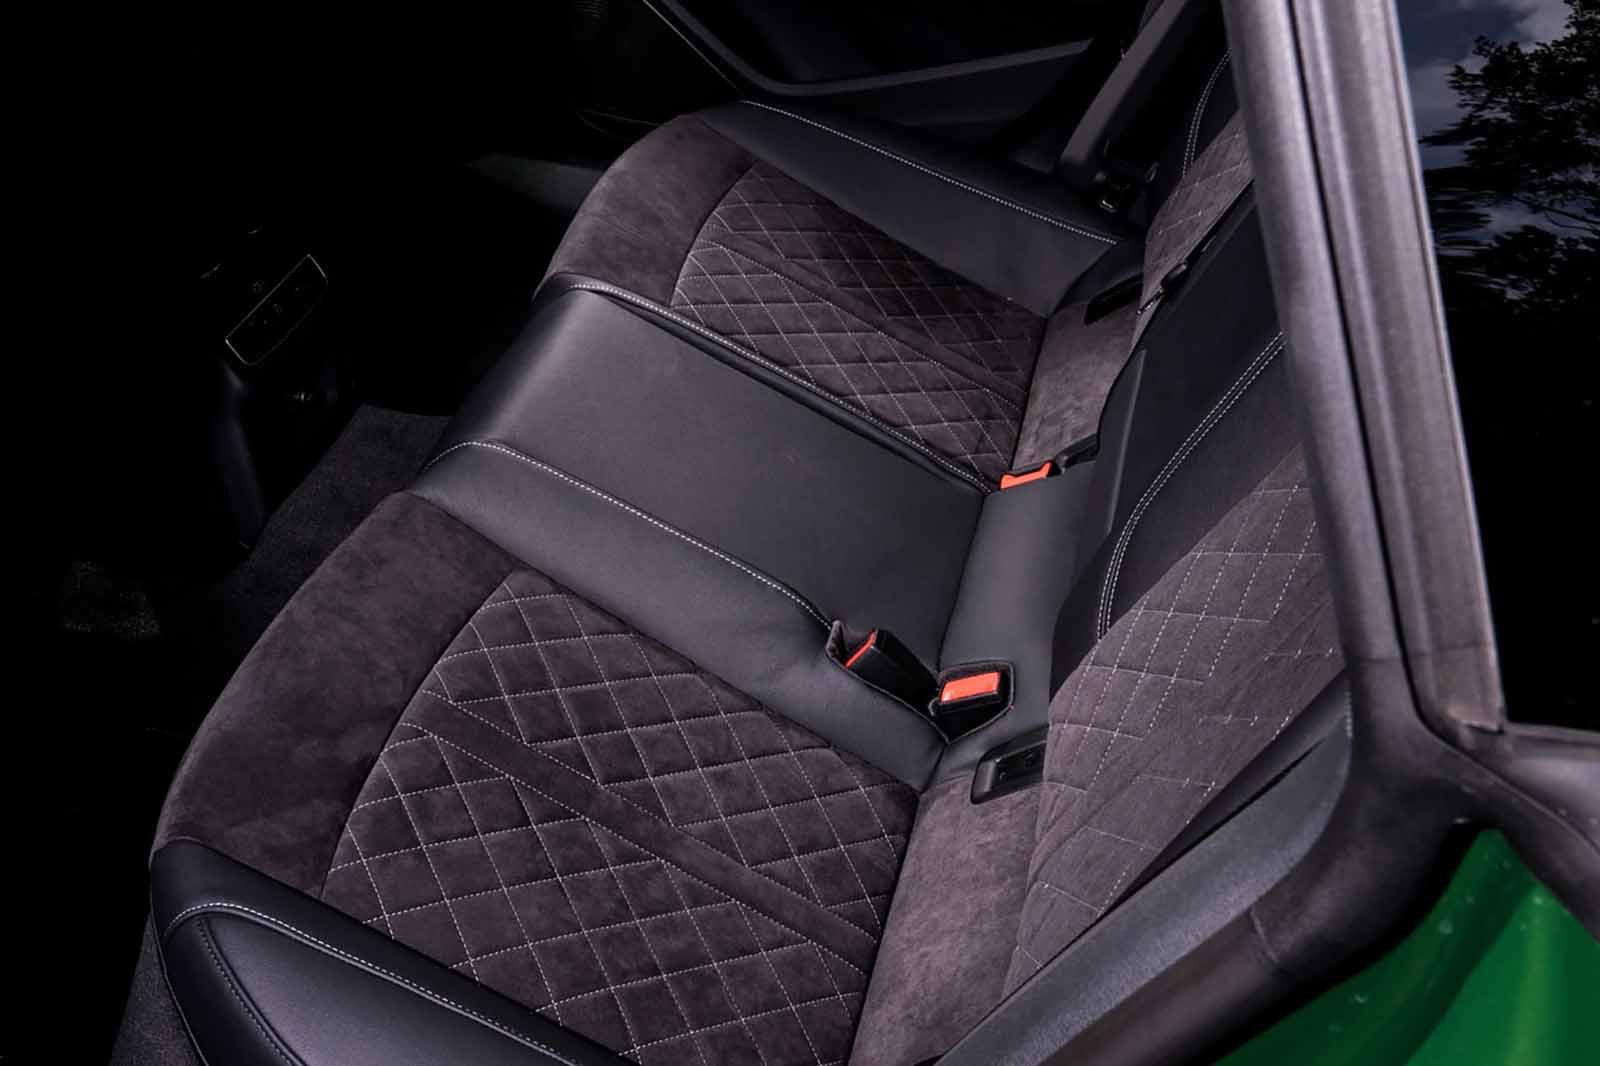 Audi RS5 Sportback 2019 RHD rear seats